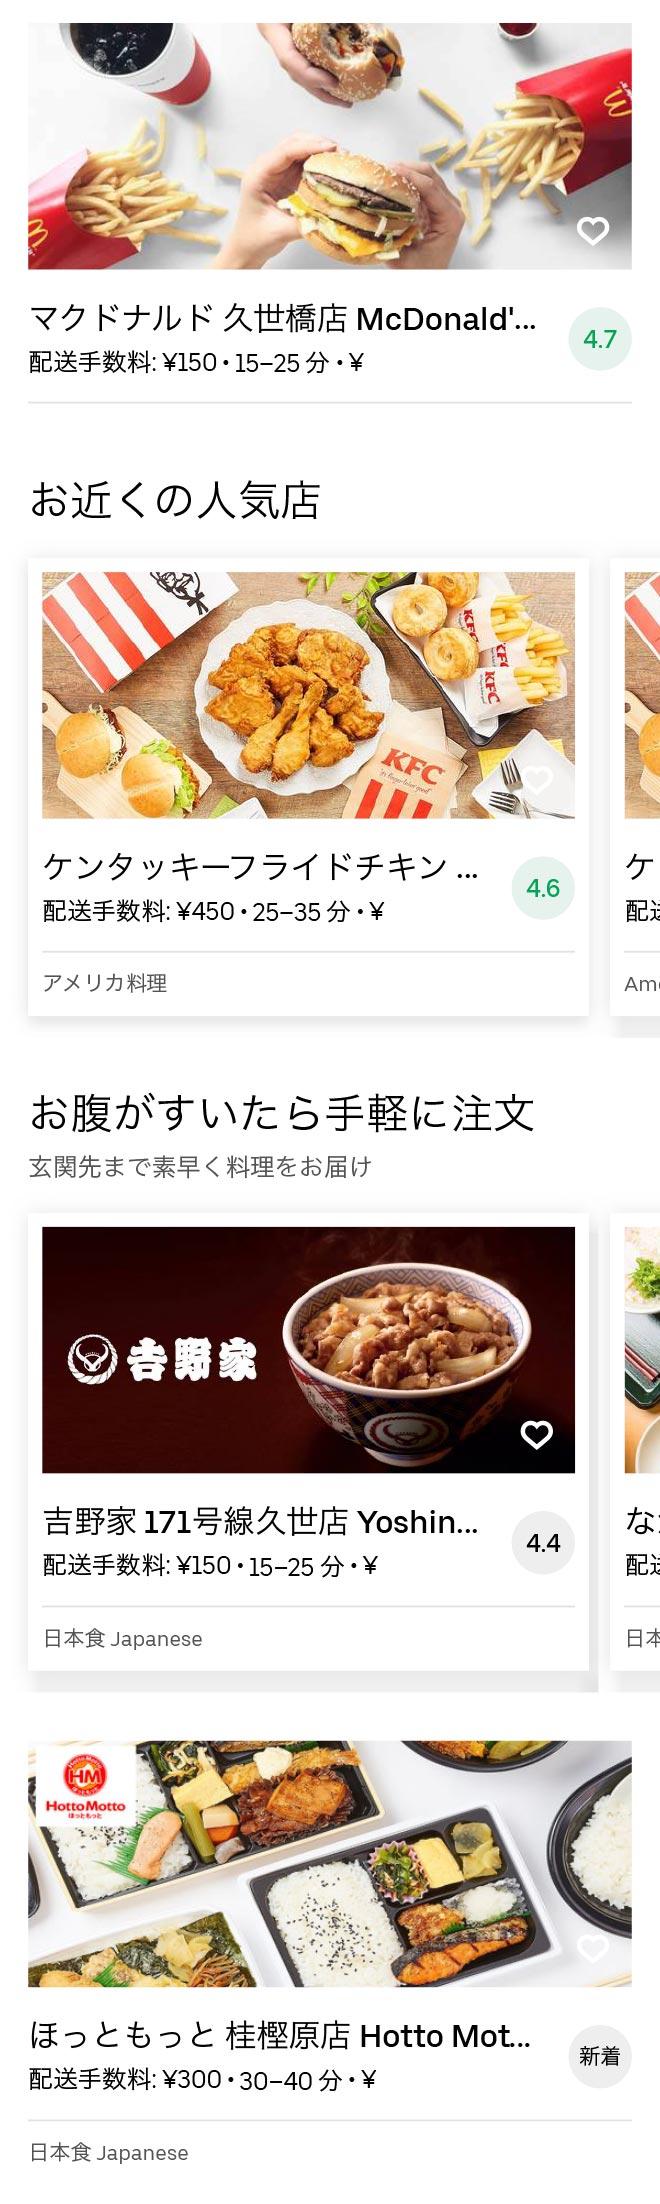 Mukoumachi menu 2008 01